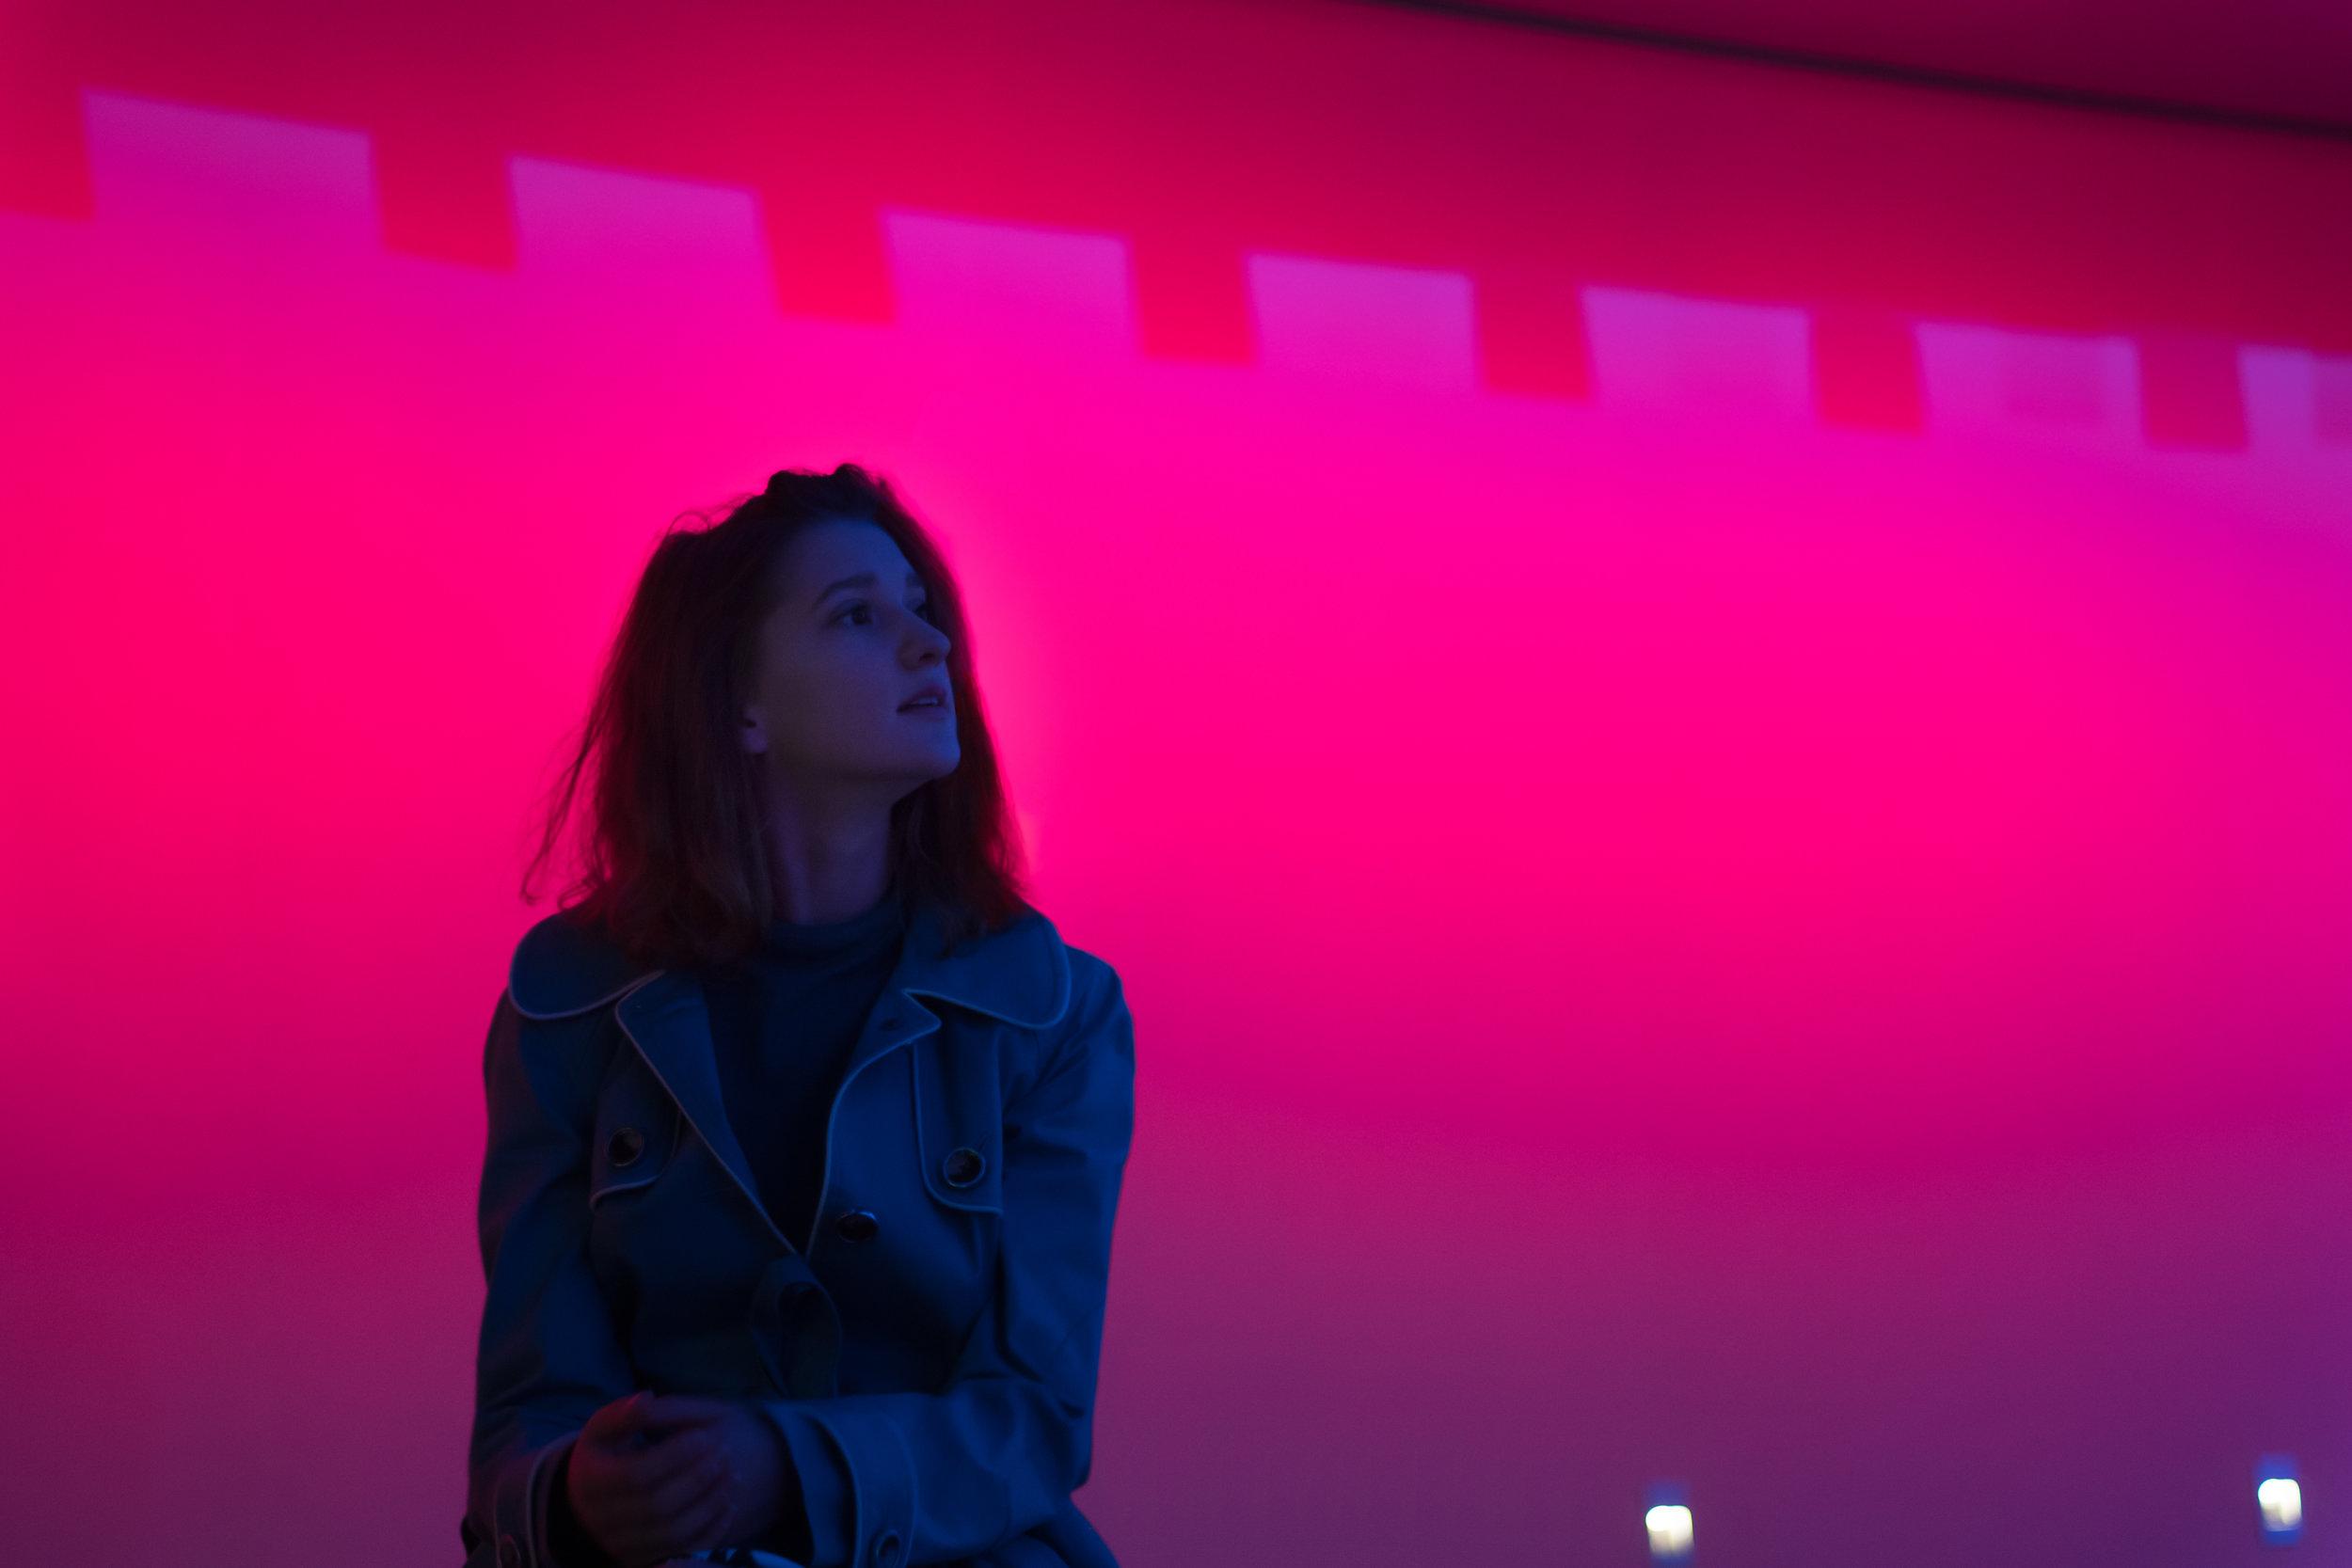 Movement & Lights - 2017